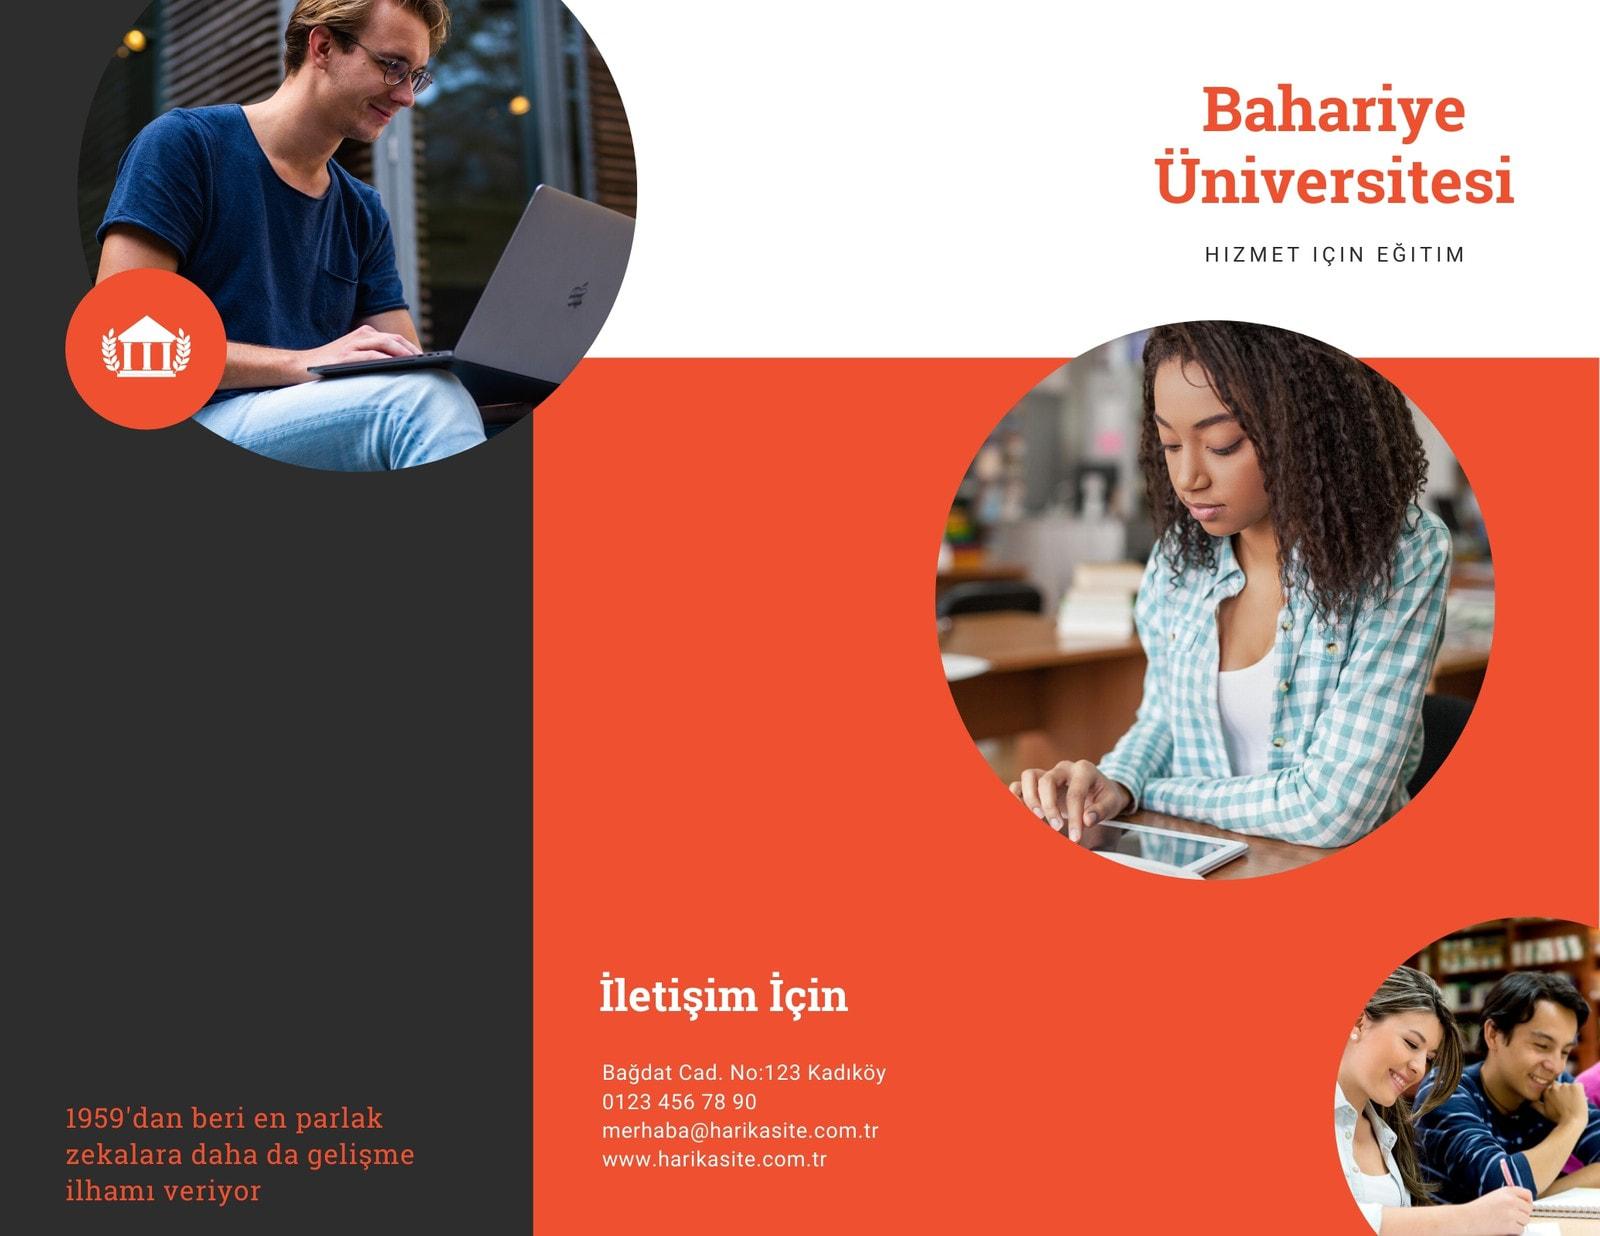 Kırmızı Siyah Gri Üniversite Üç Katlı Broşür